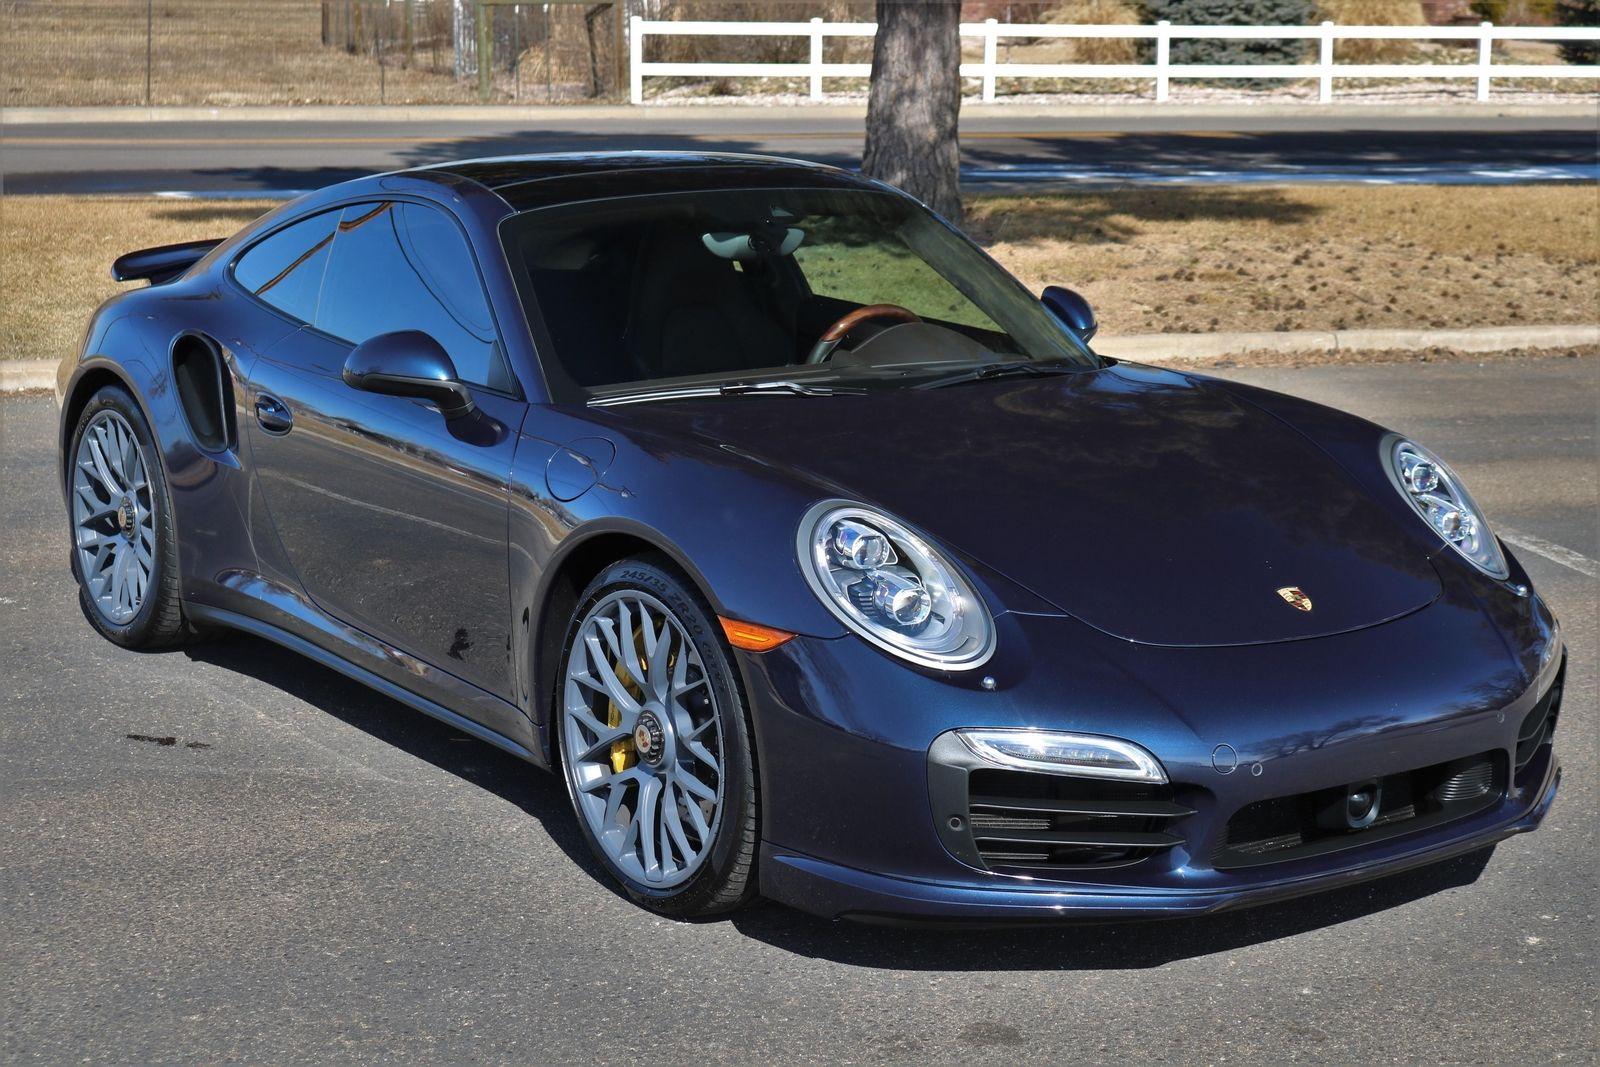 AwesomeAmazingGreat-2014-Porsche-911-Turbo-S-2014-Porsche-911-Turbo-S-Well-Optioned-Dark-Blue-Espresso-PDK-2017-20182018-201920172018